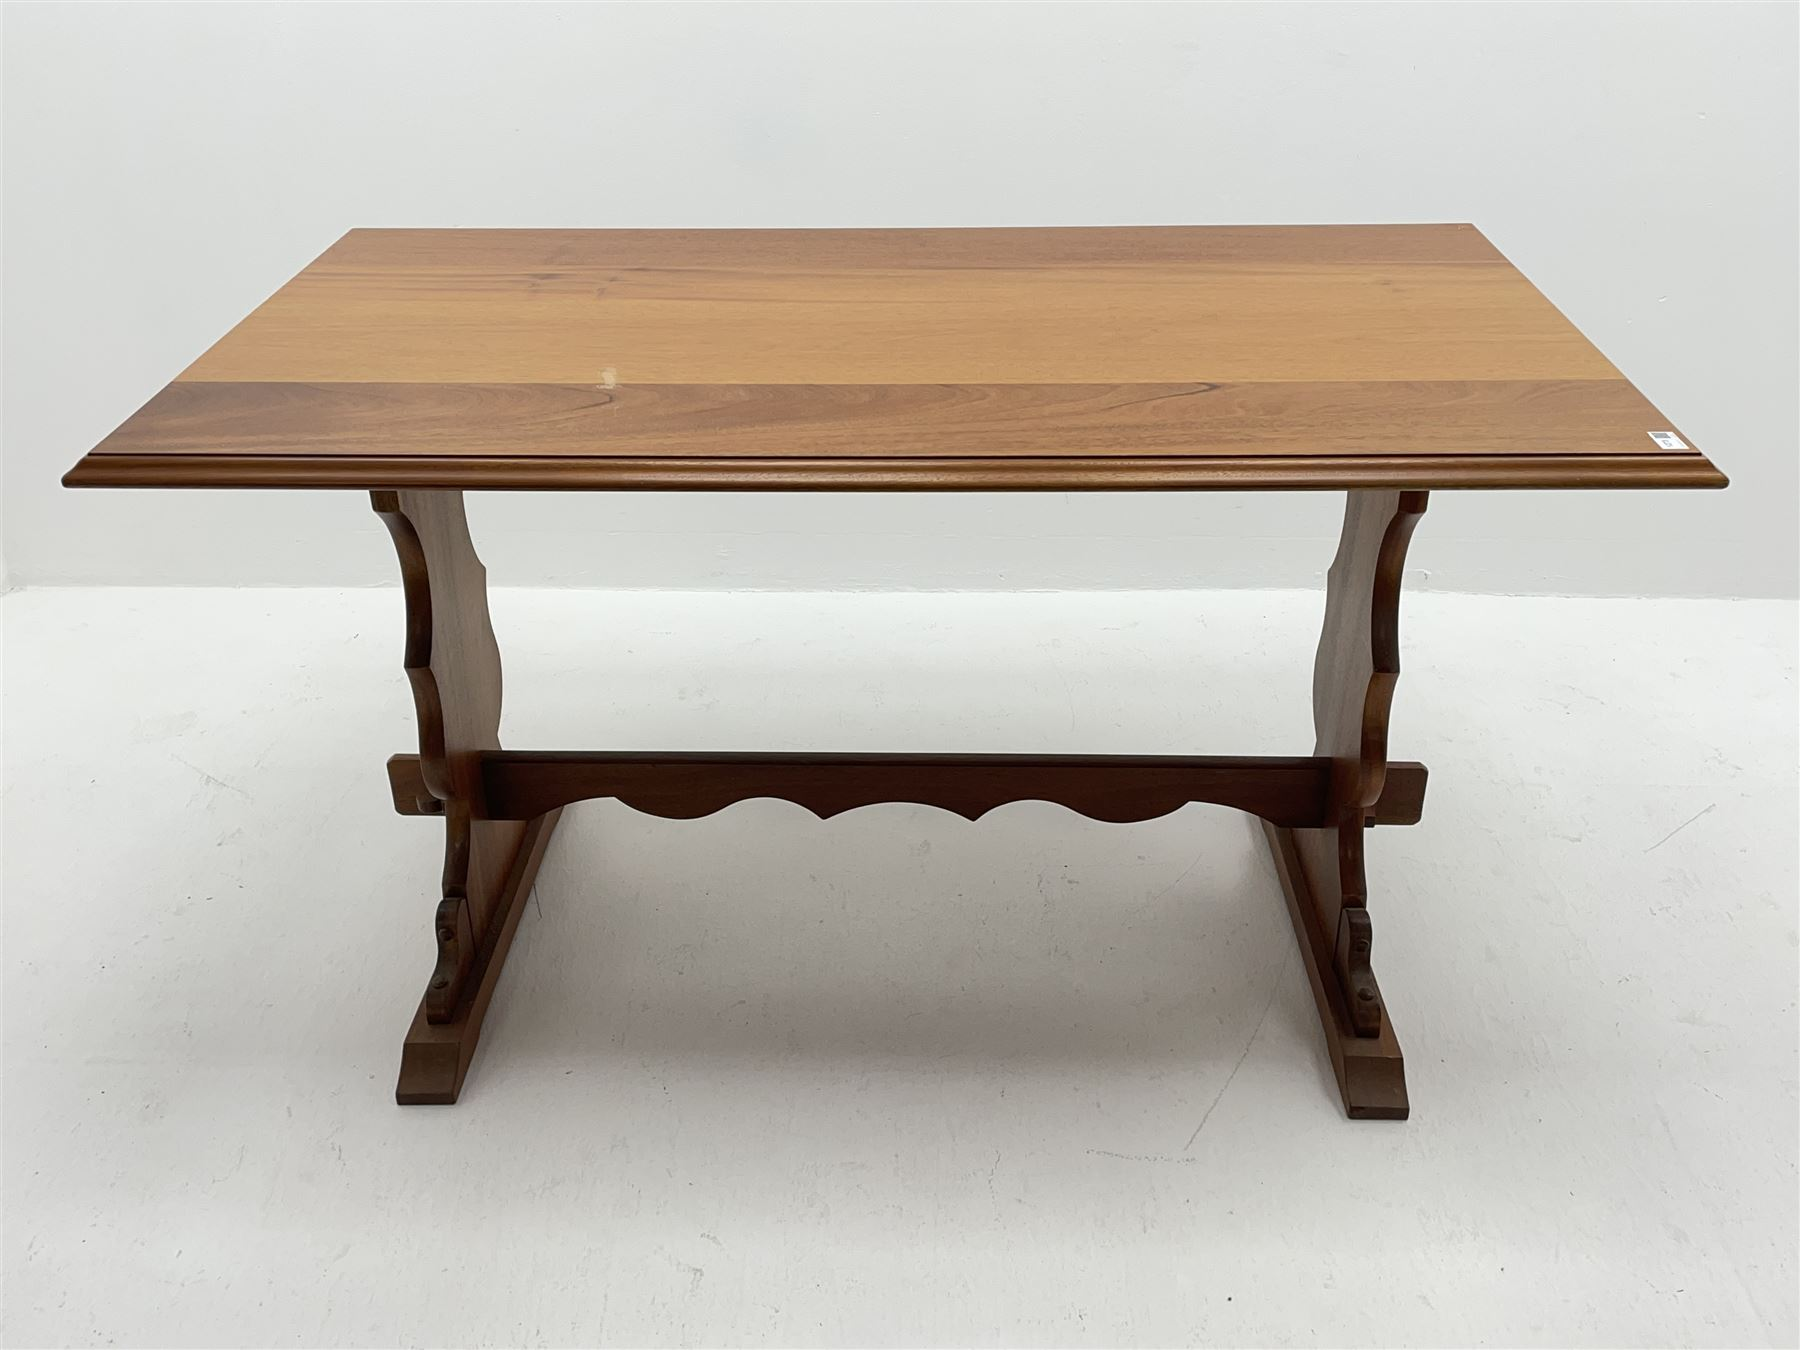 Late 20th century teak table - Image 3 of 3